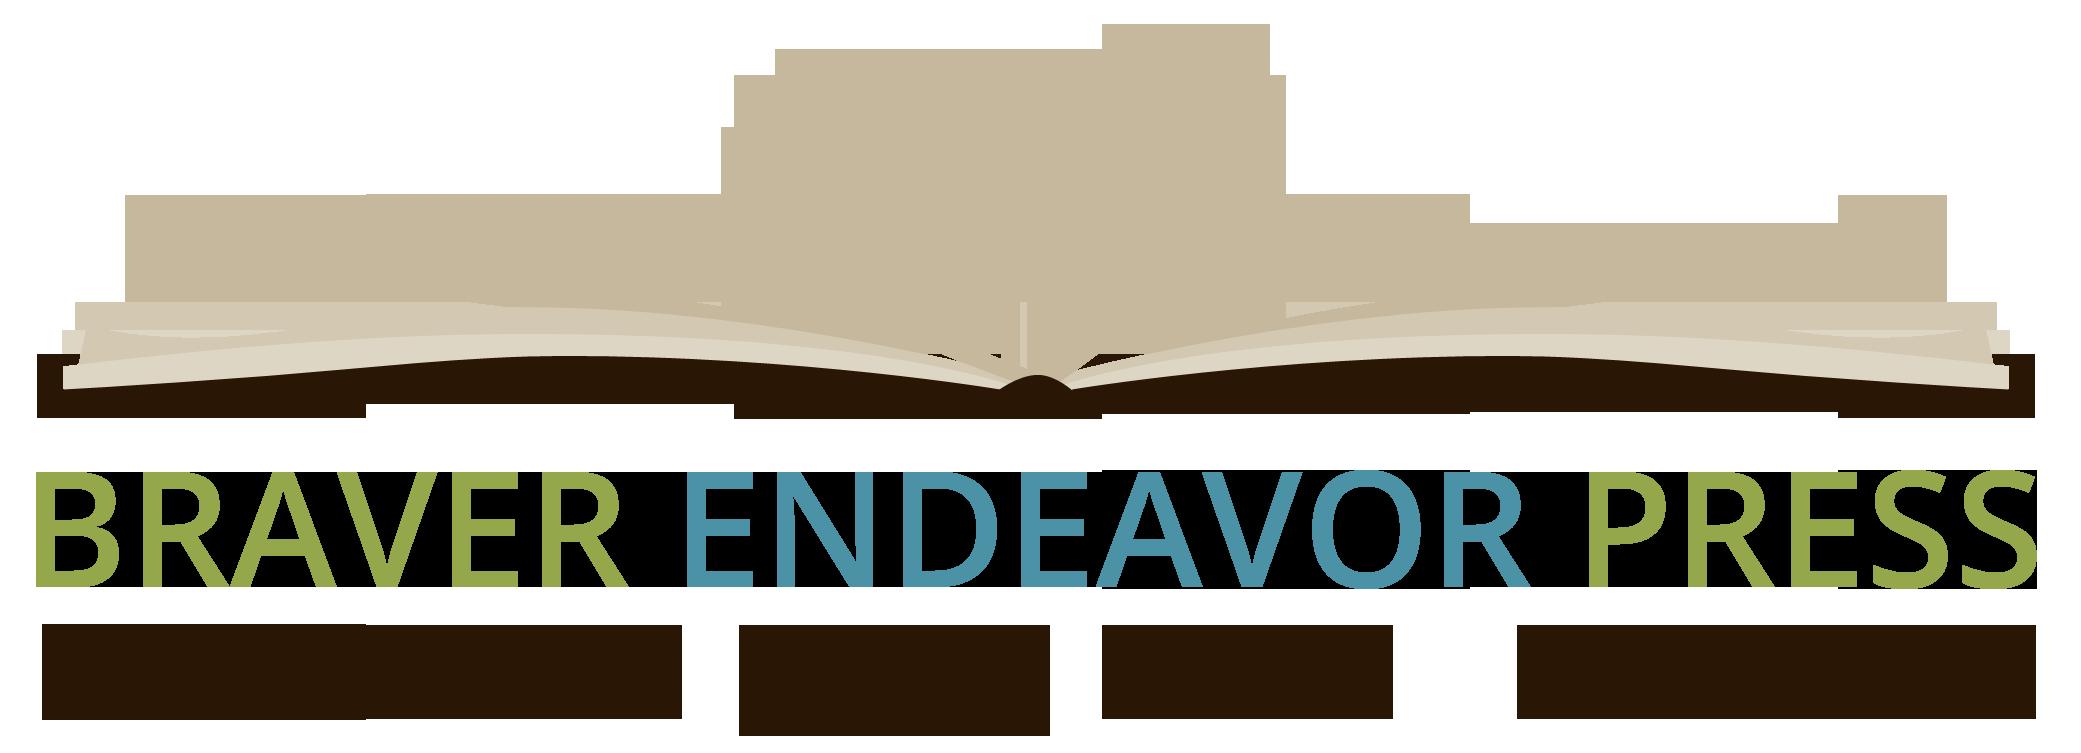 Braver Endeavor Press logo